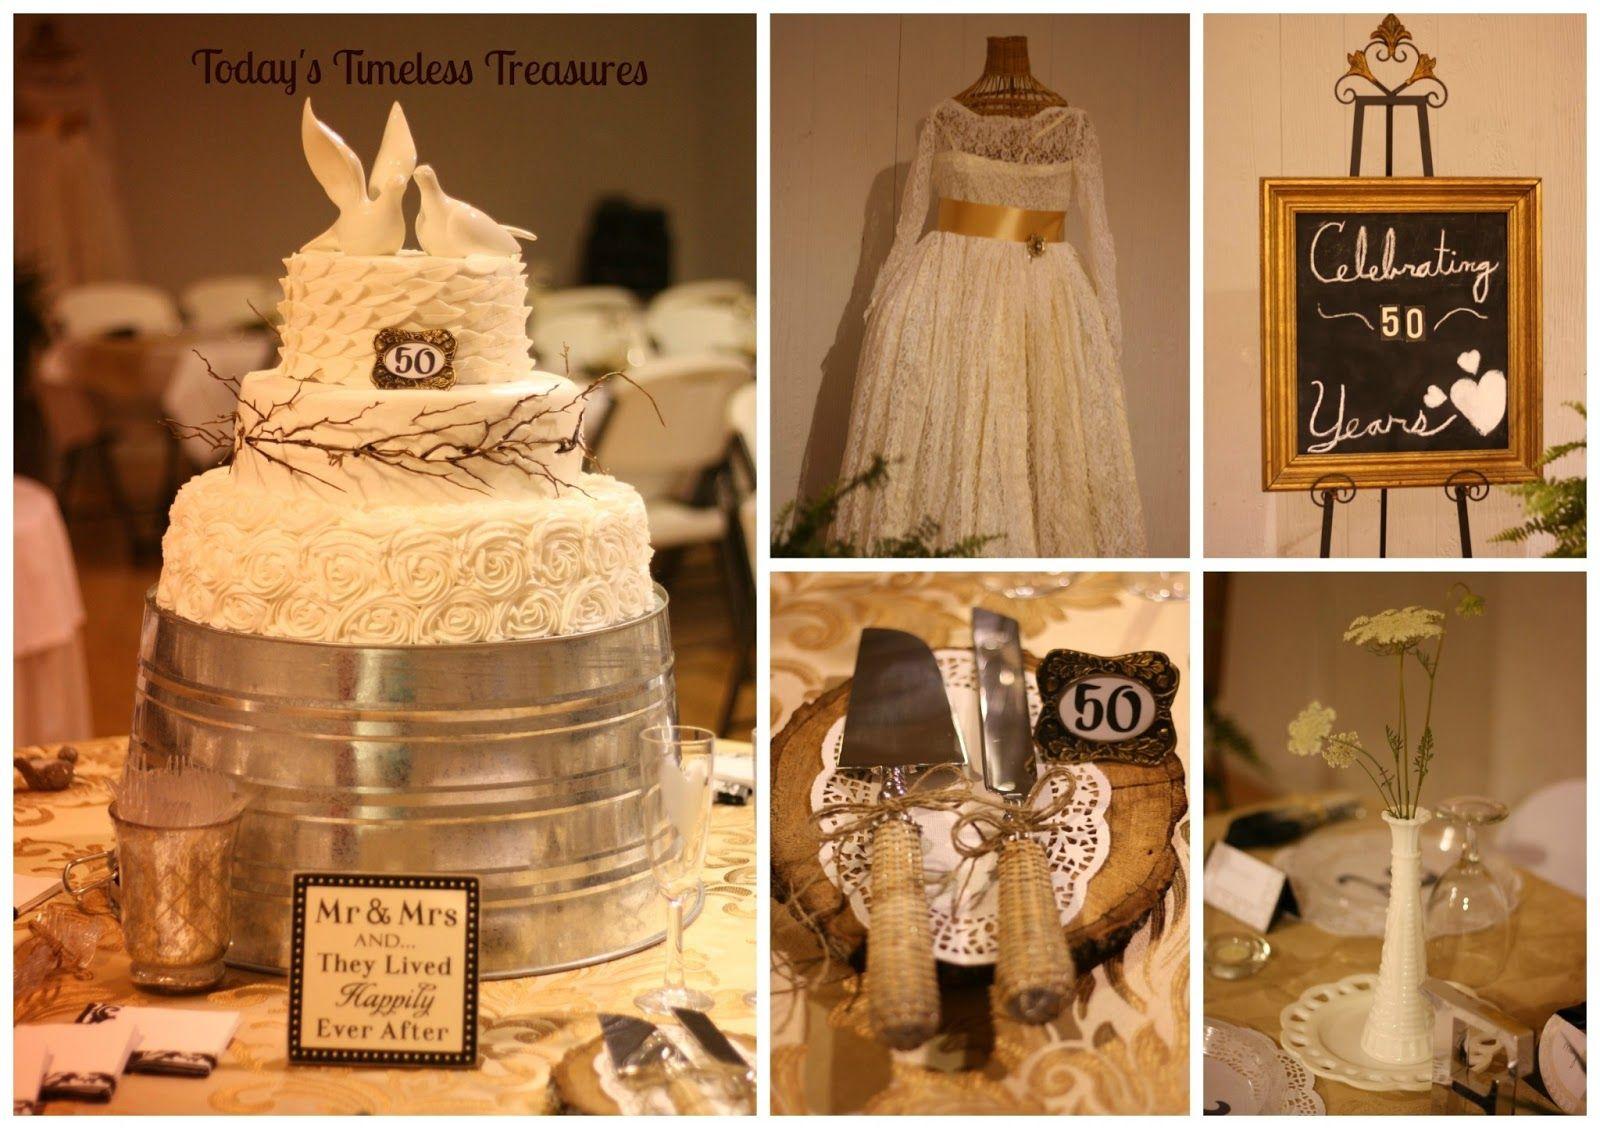 Decoration ideas for 40th wedding anniversary  Ideas  Comments Off on th Wedding Anniversary Decorations Ideas